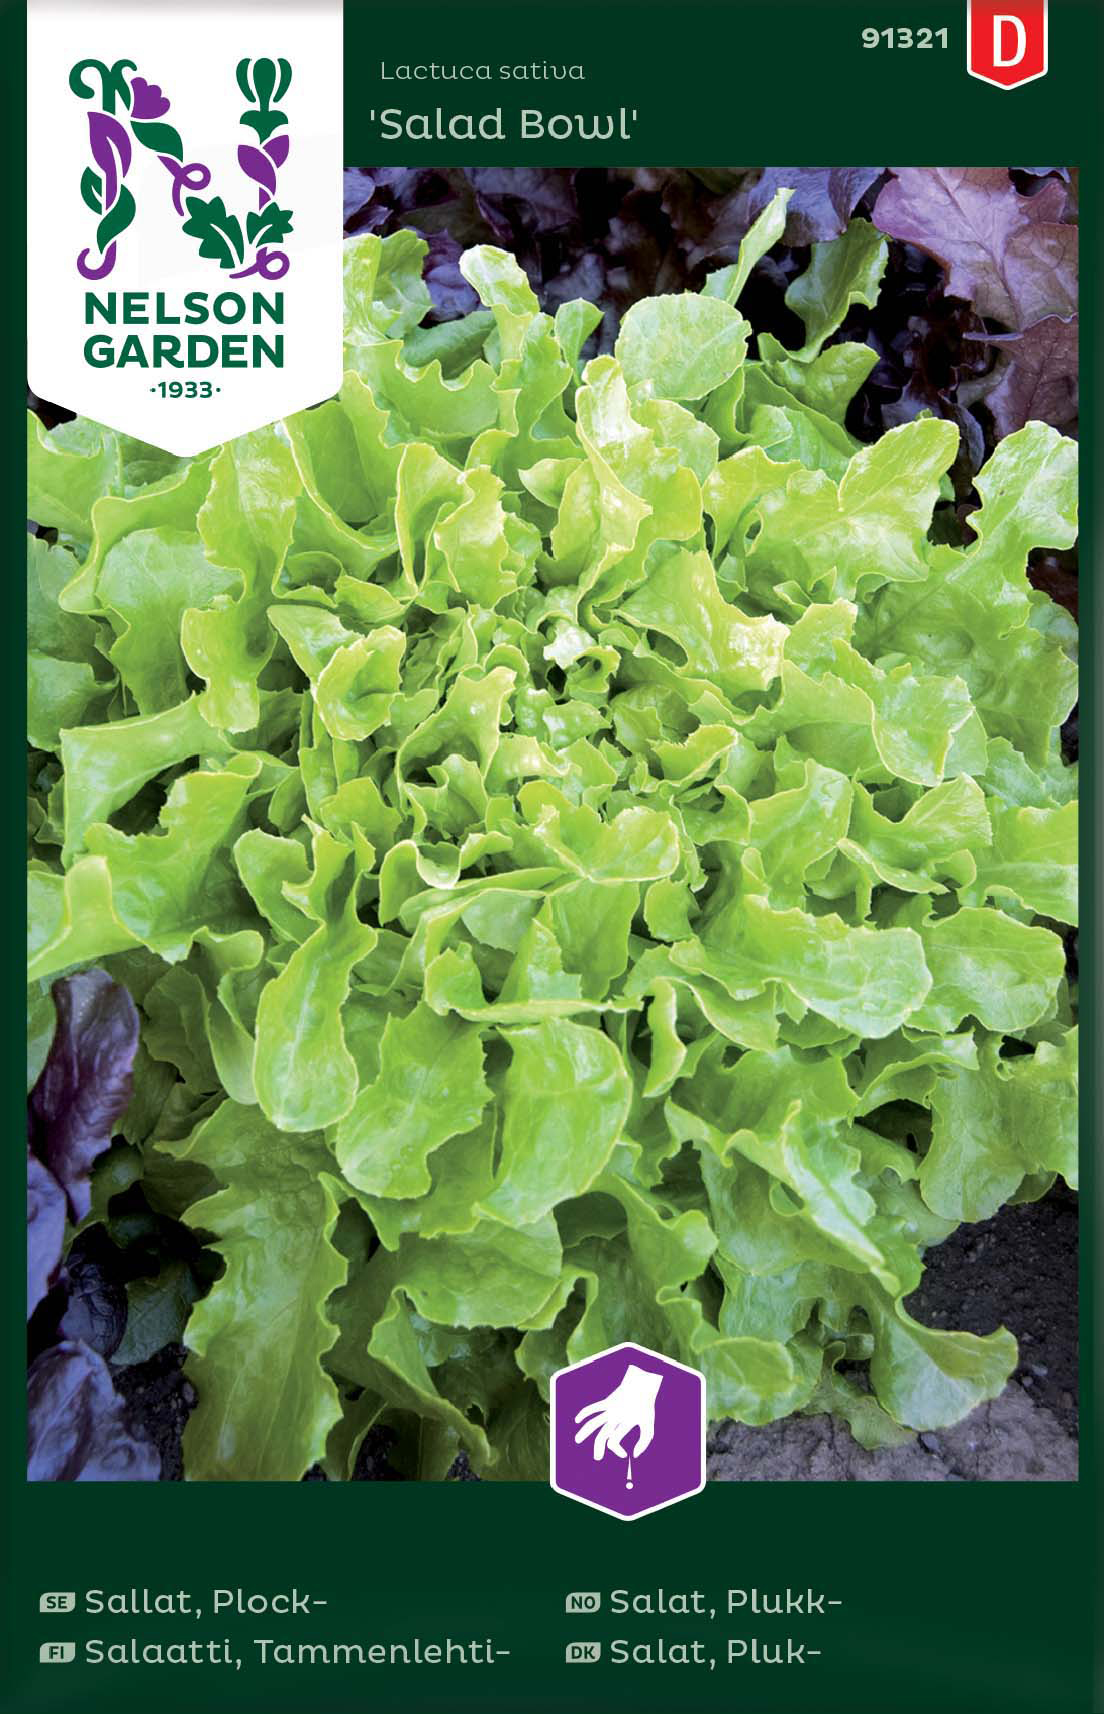 Fröer Nelson Garden Sallat Plock- Salad Bowl Grön